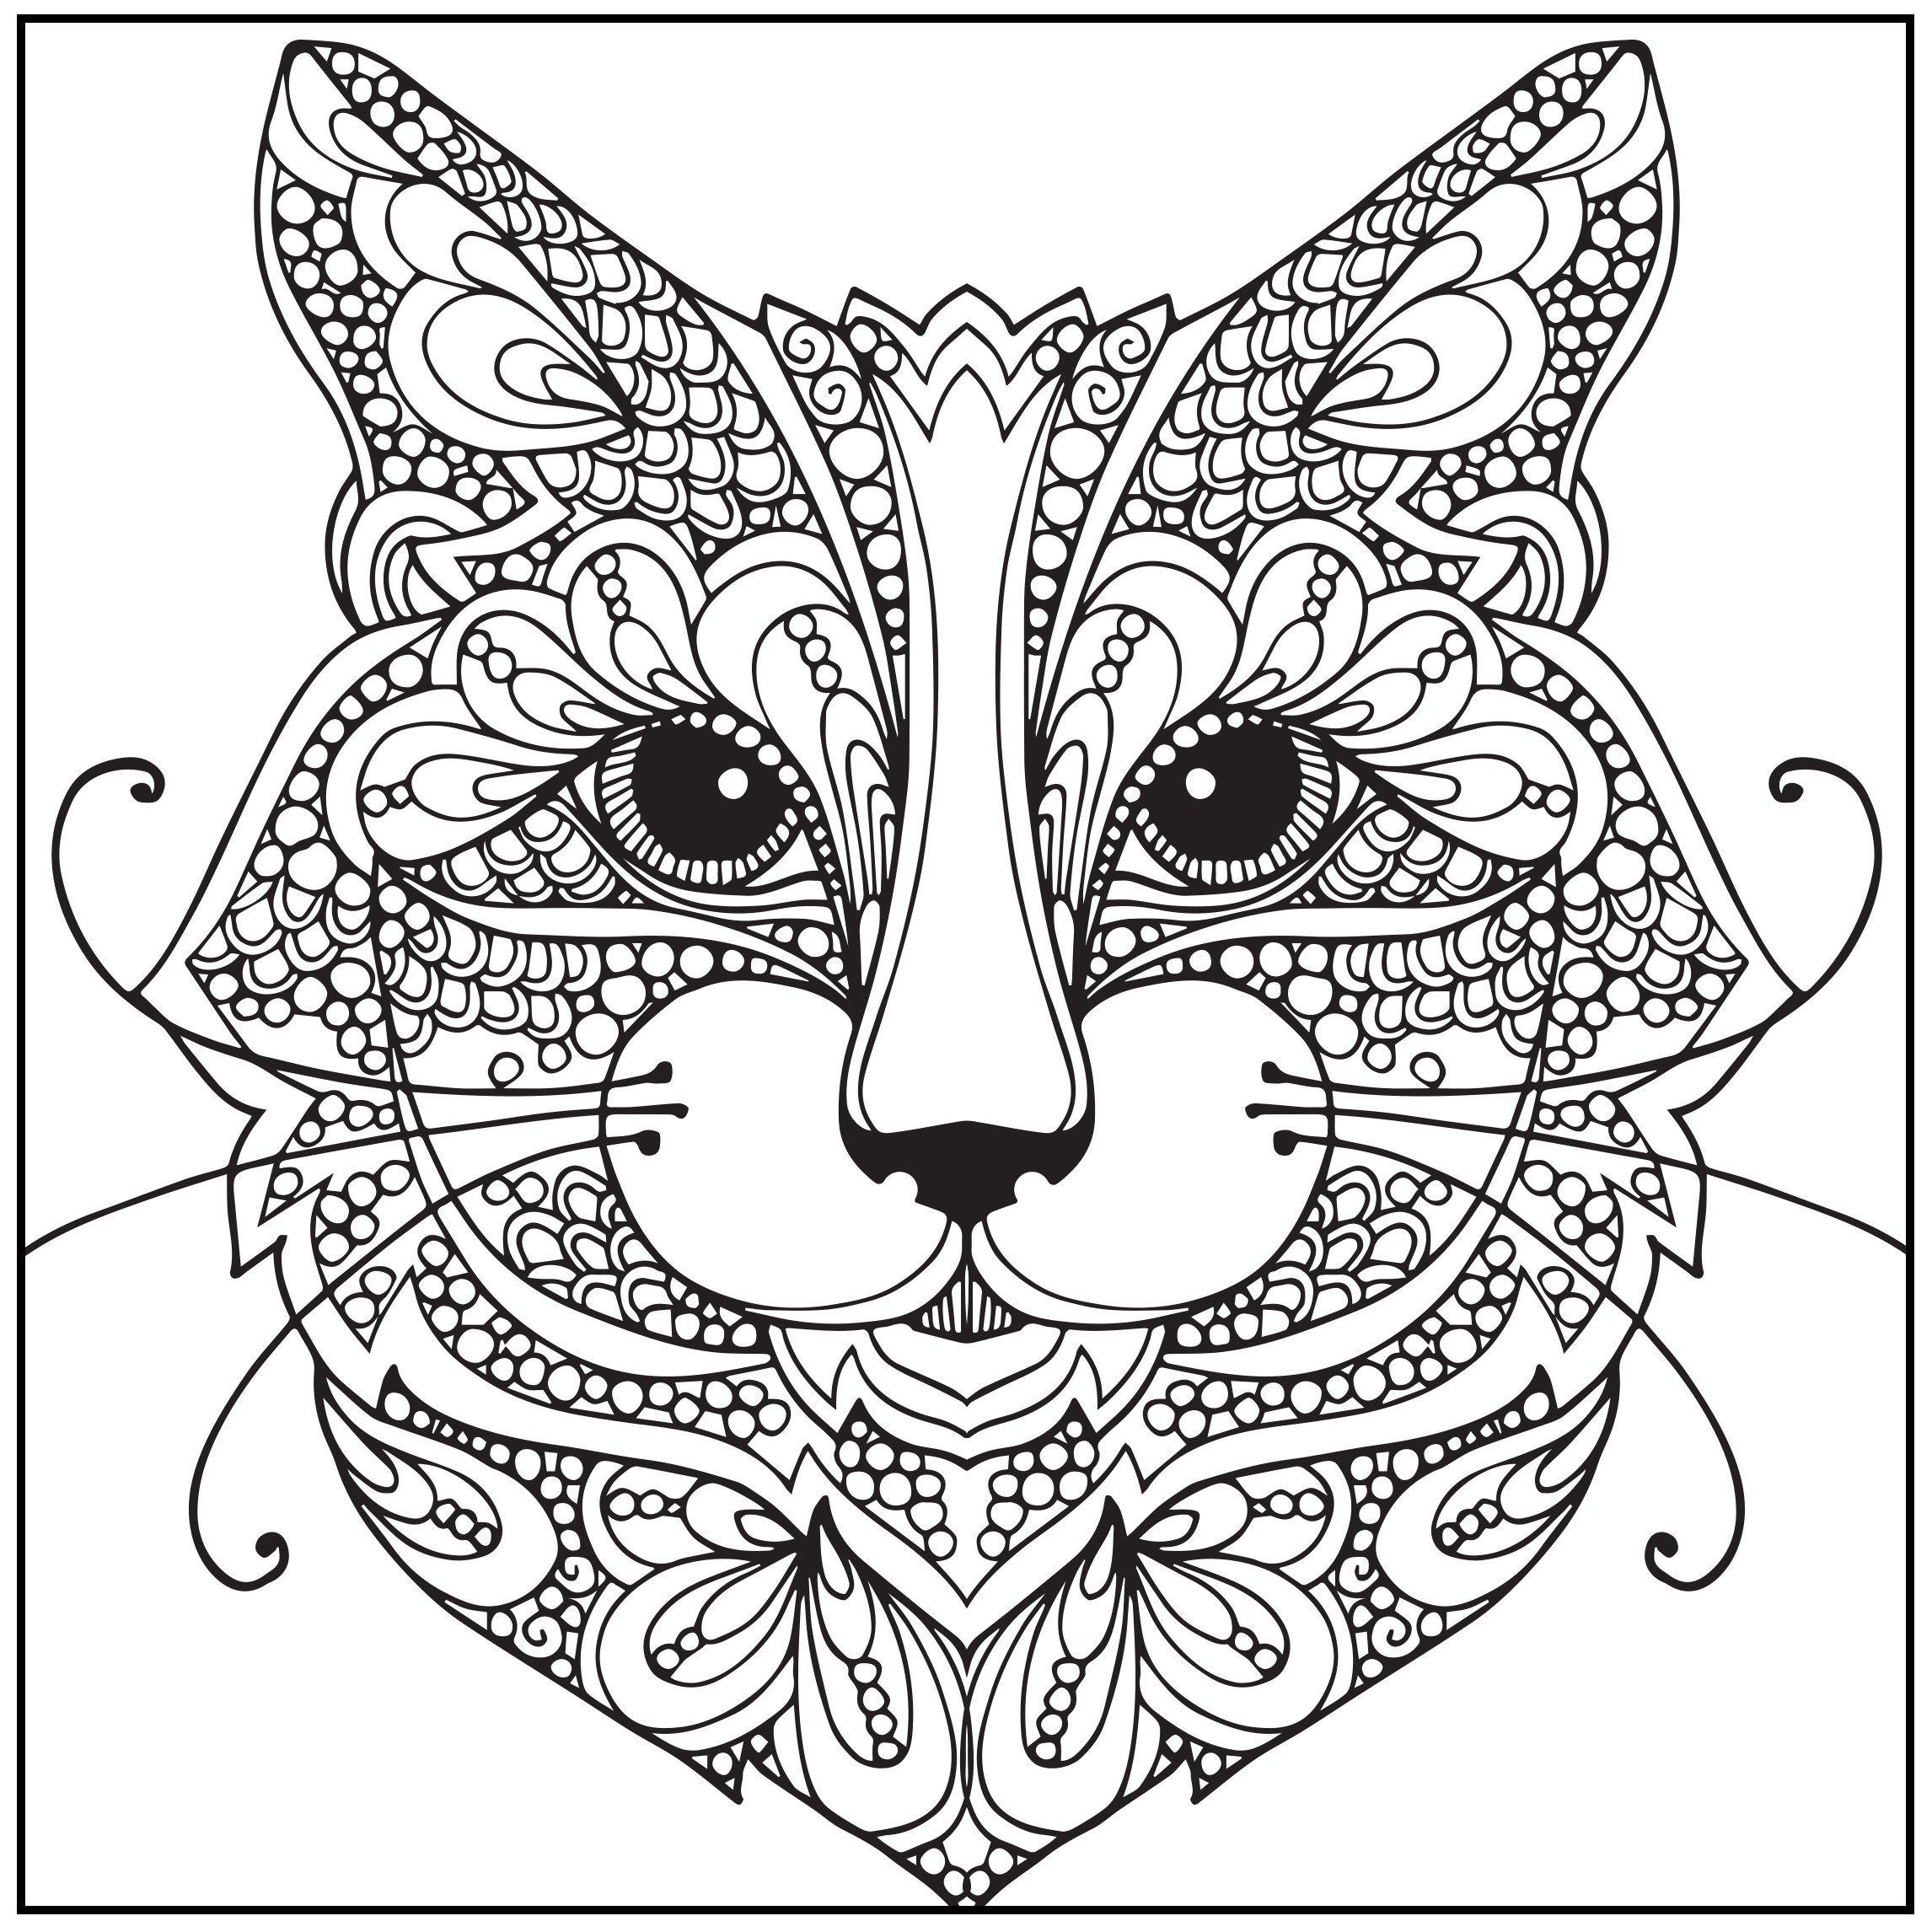 Stress relieving cats coloring - Amazon Com Adult Coloring Book Wild About Cats Stress Relieving Designs Includes Bonus